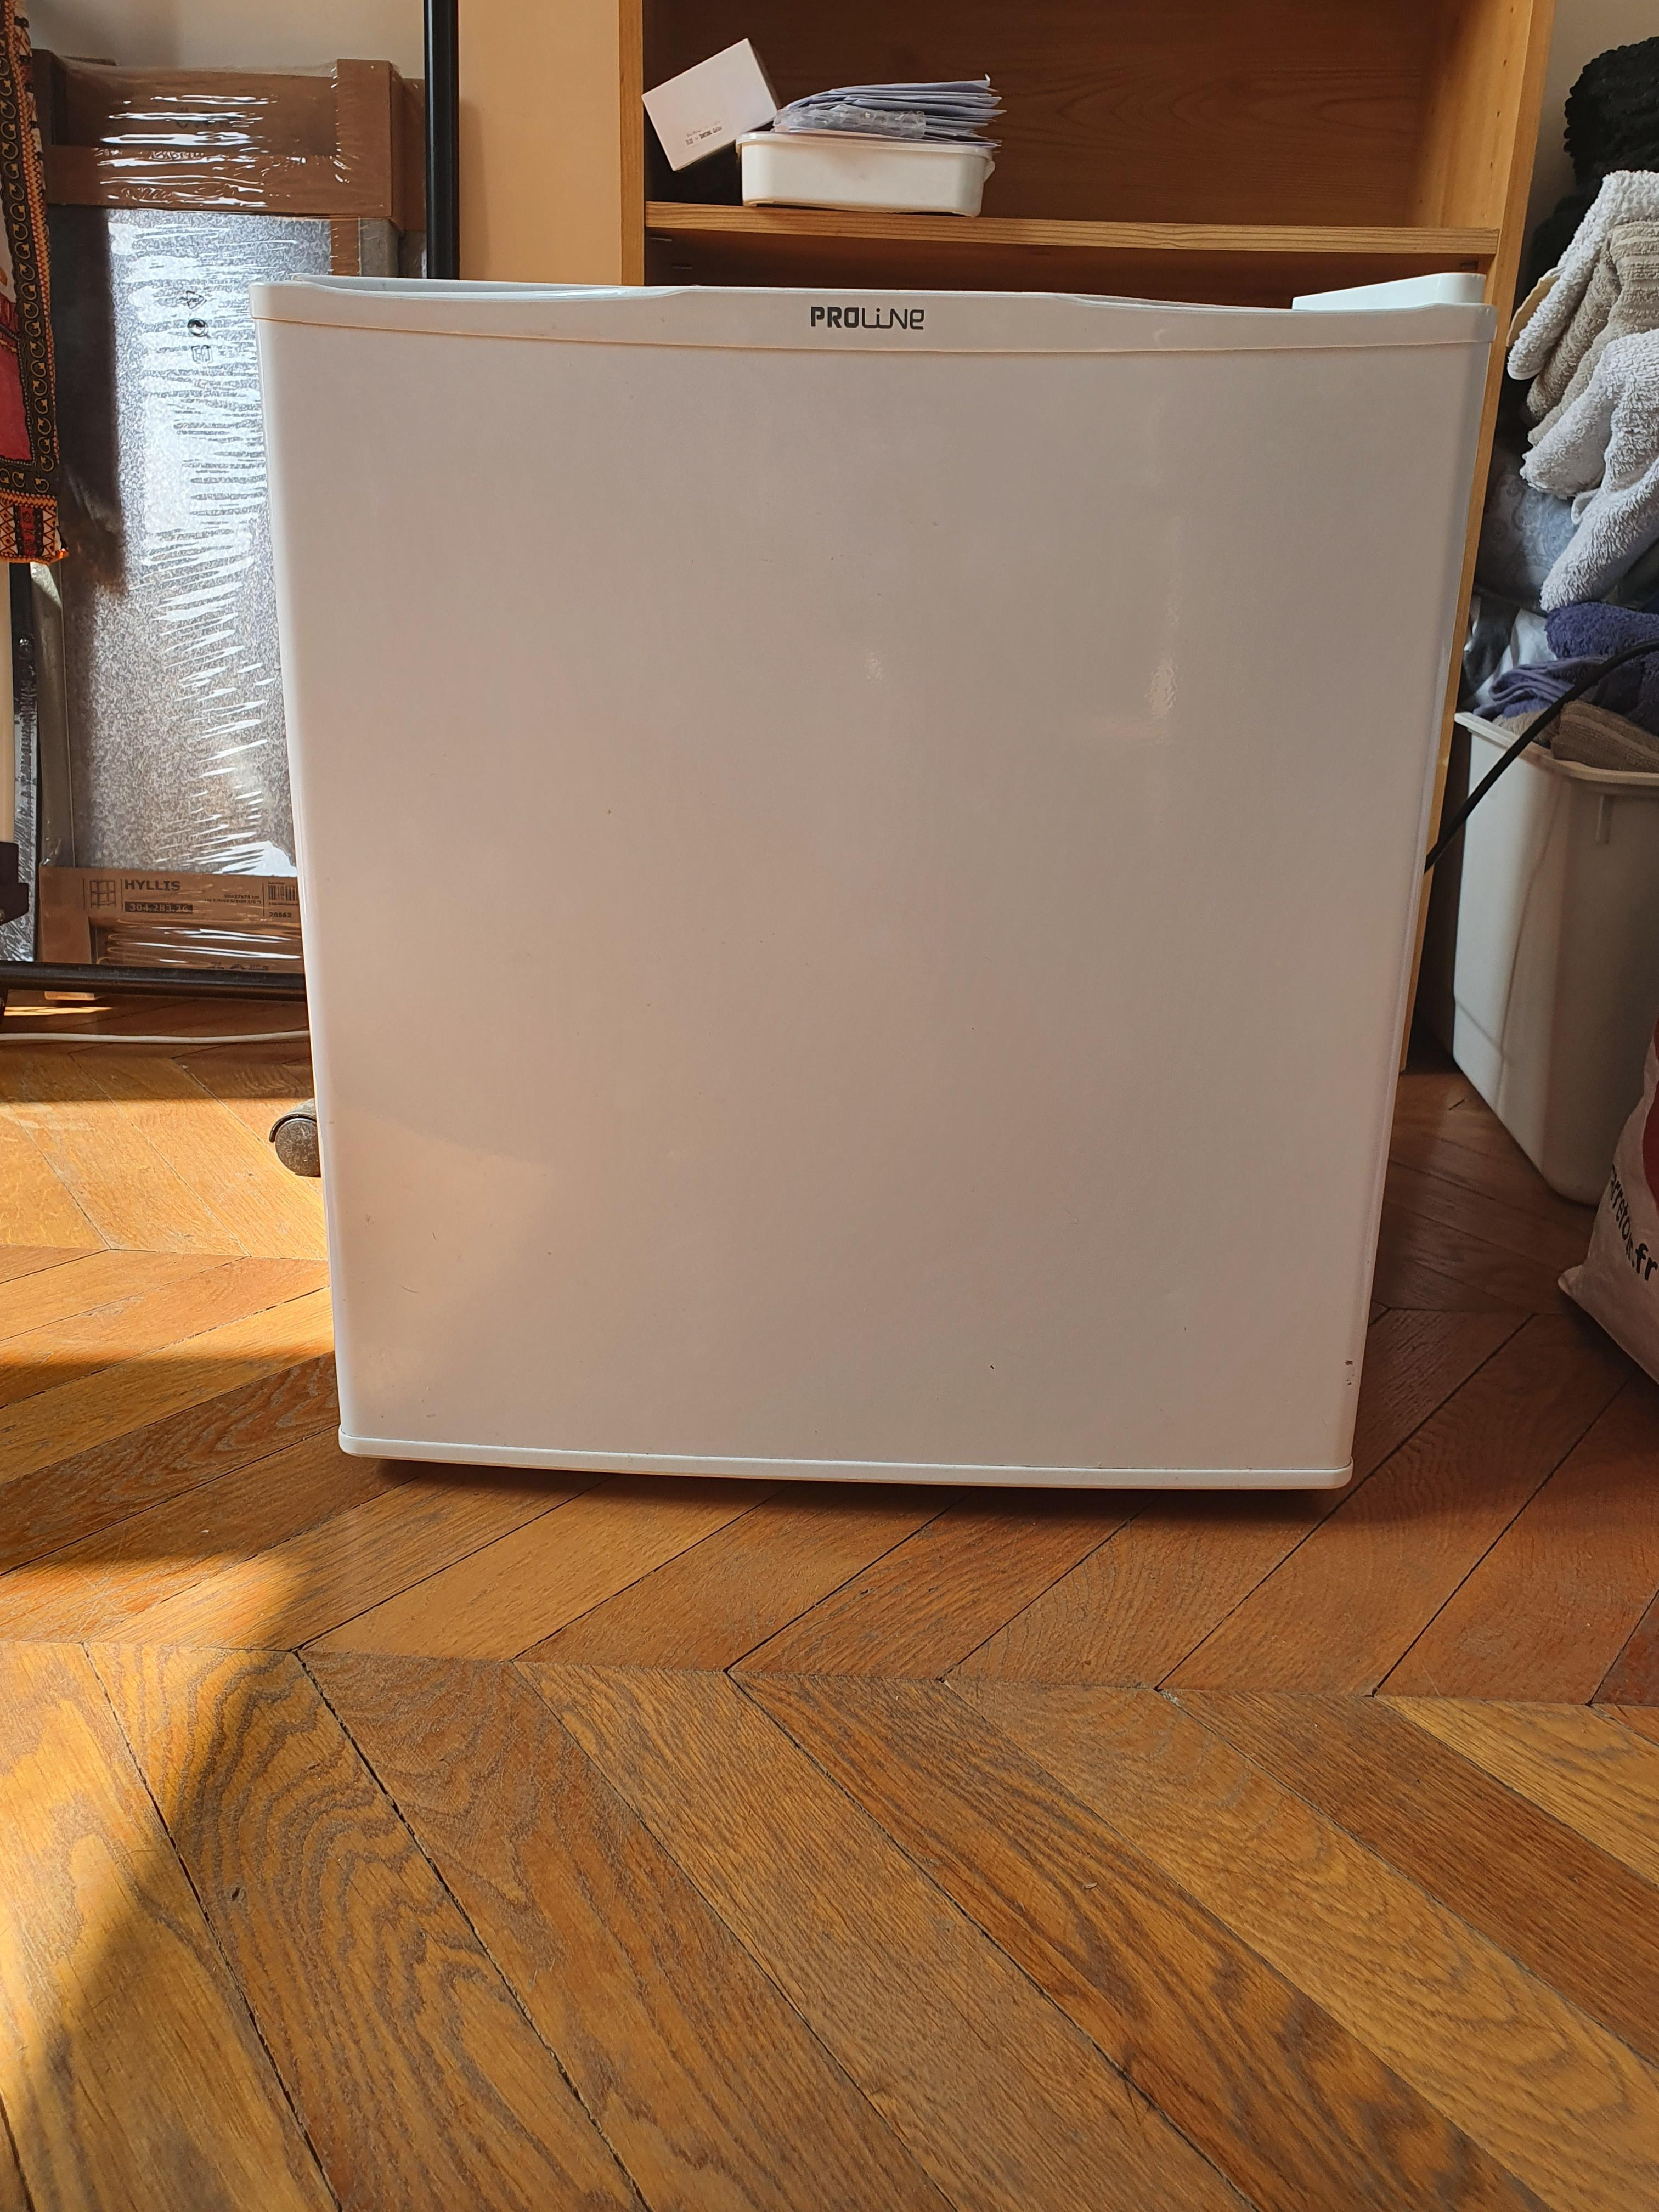 troc de troc donne mini frigo image 0